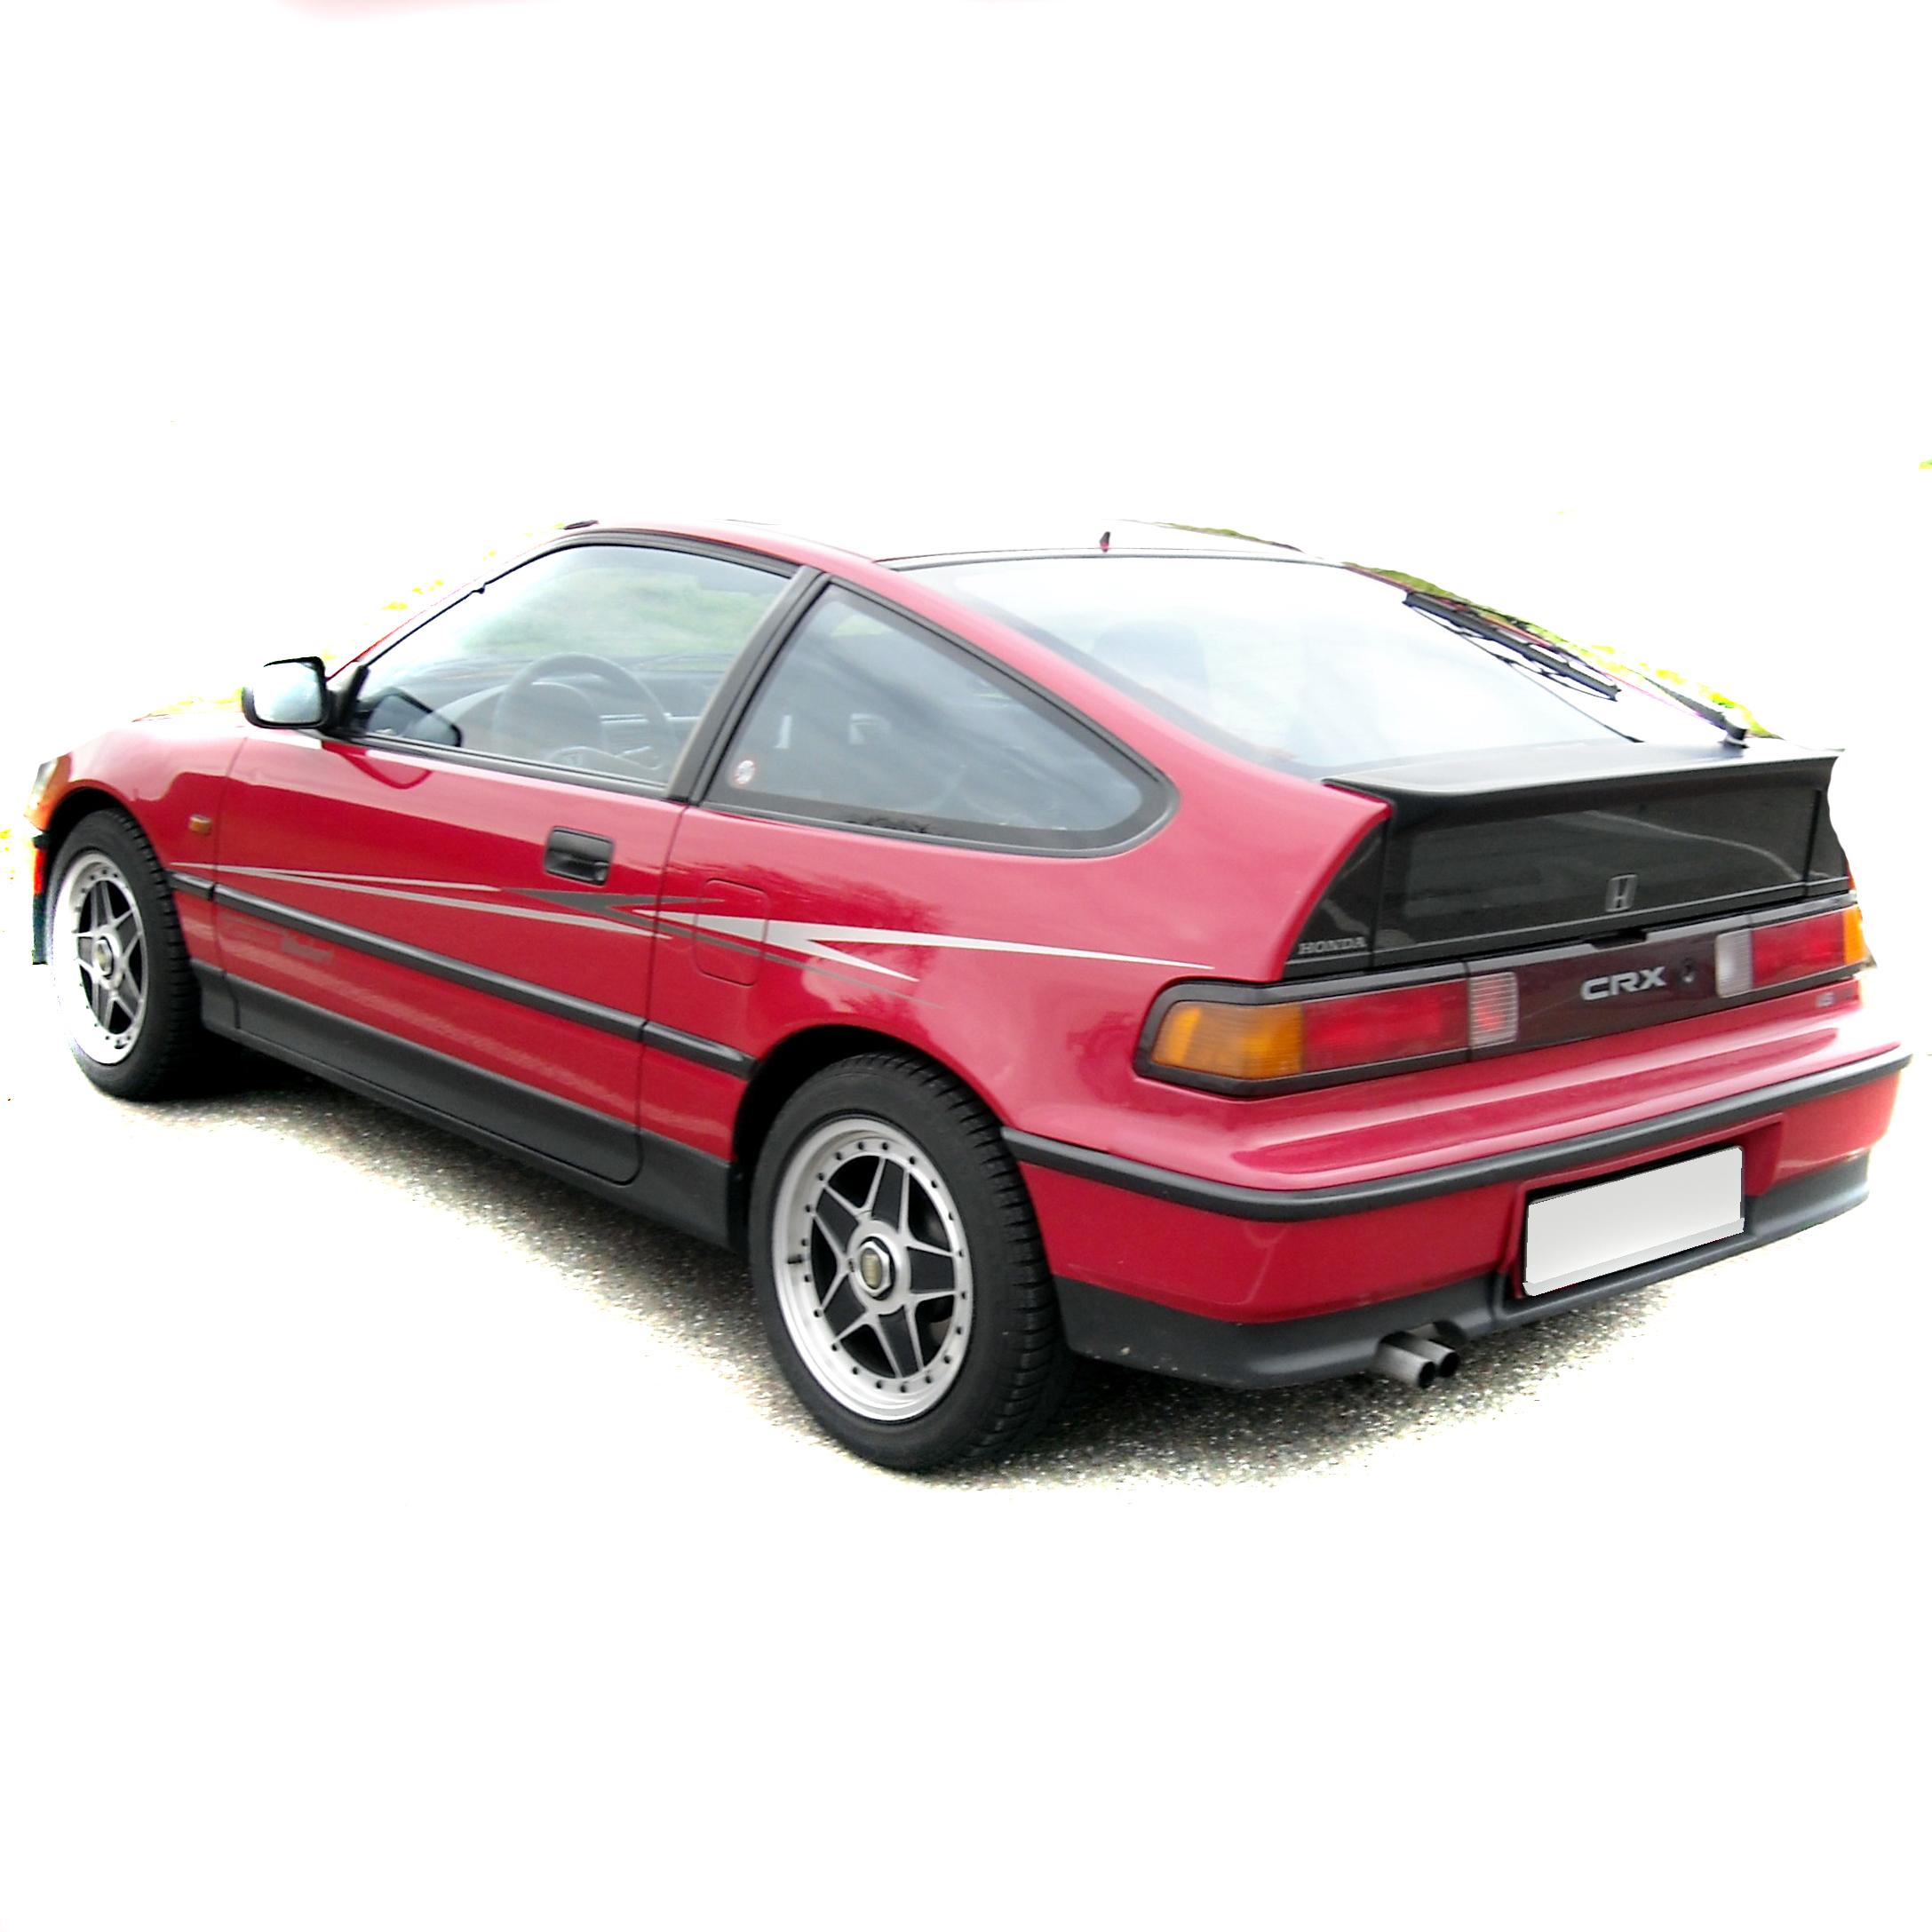 Honda CRX 1992 - 1997